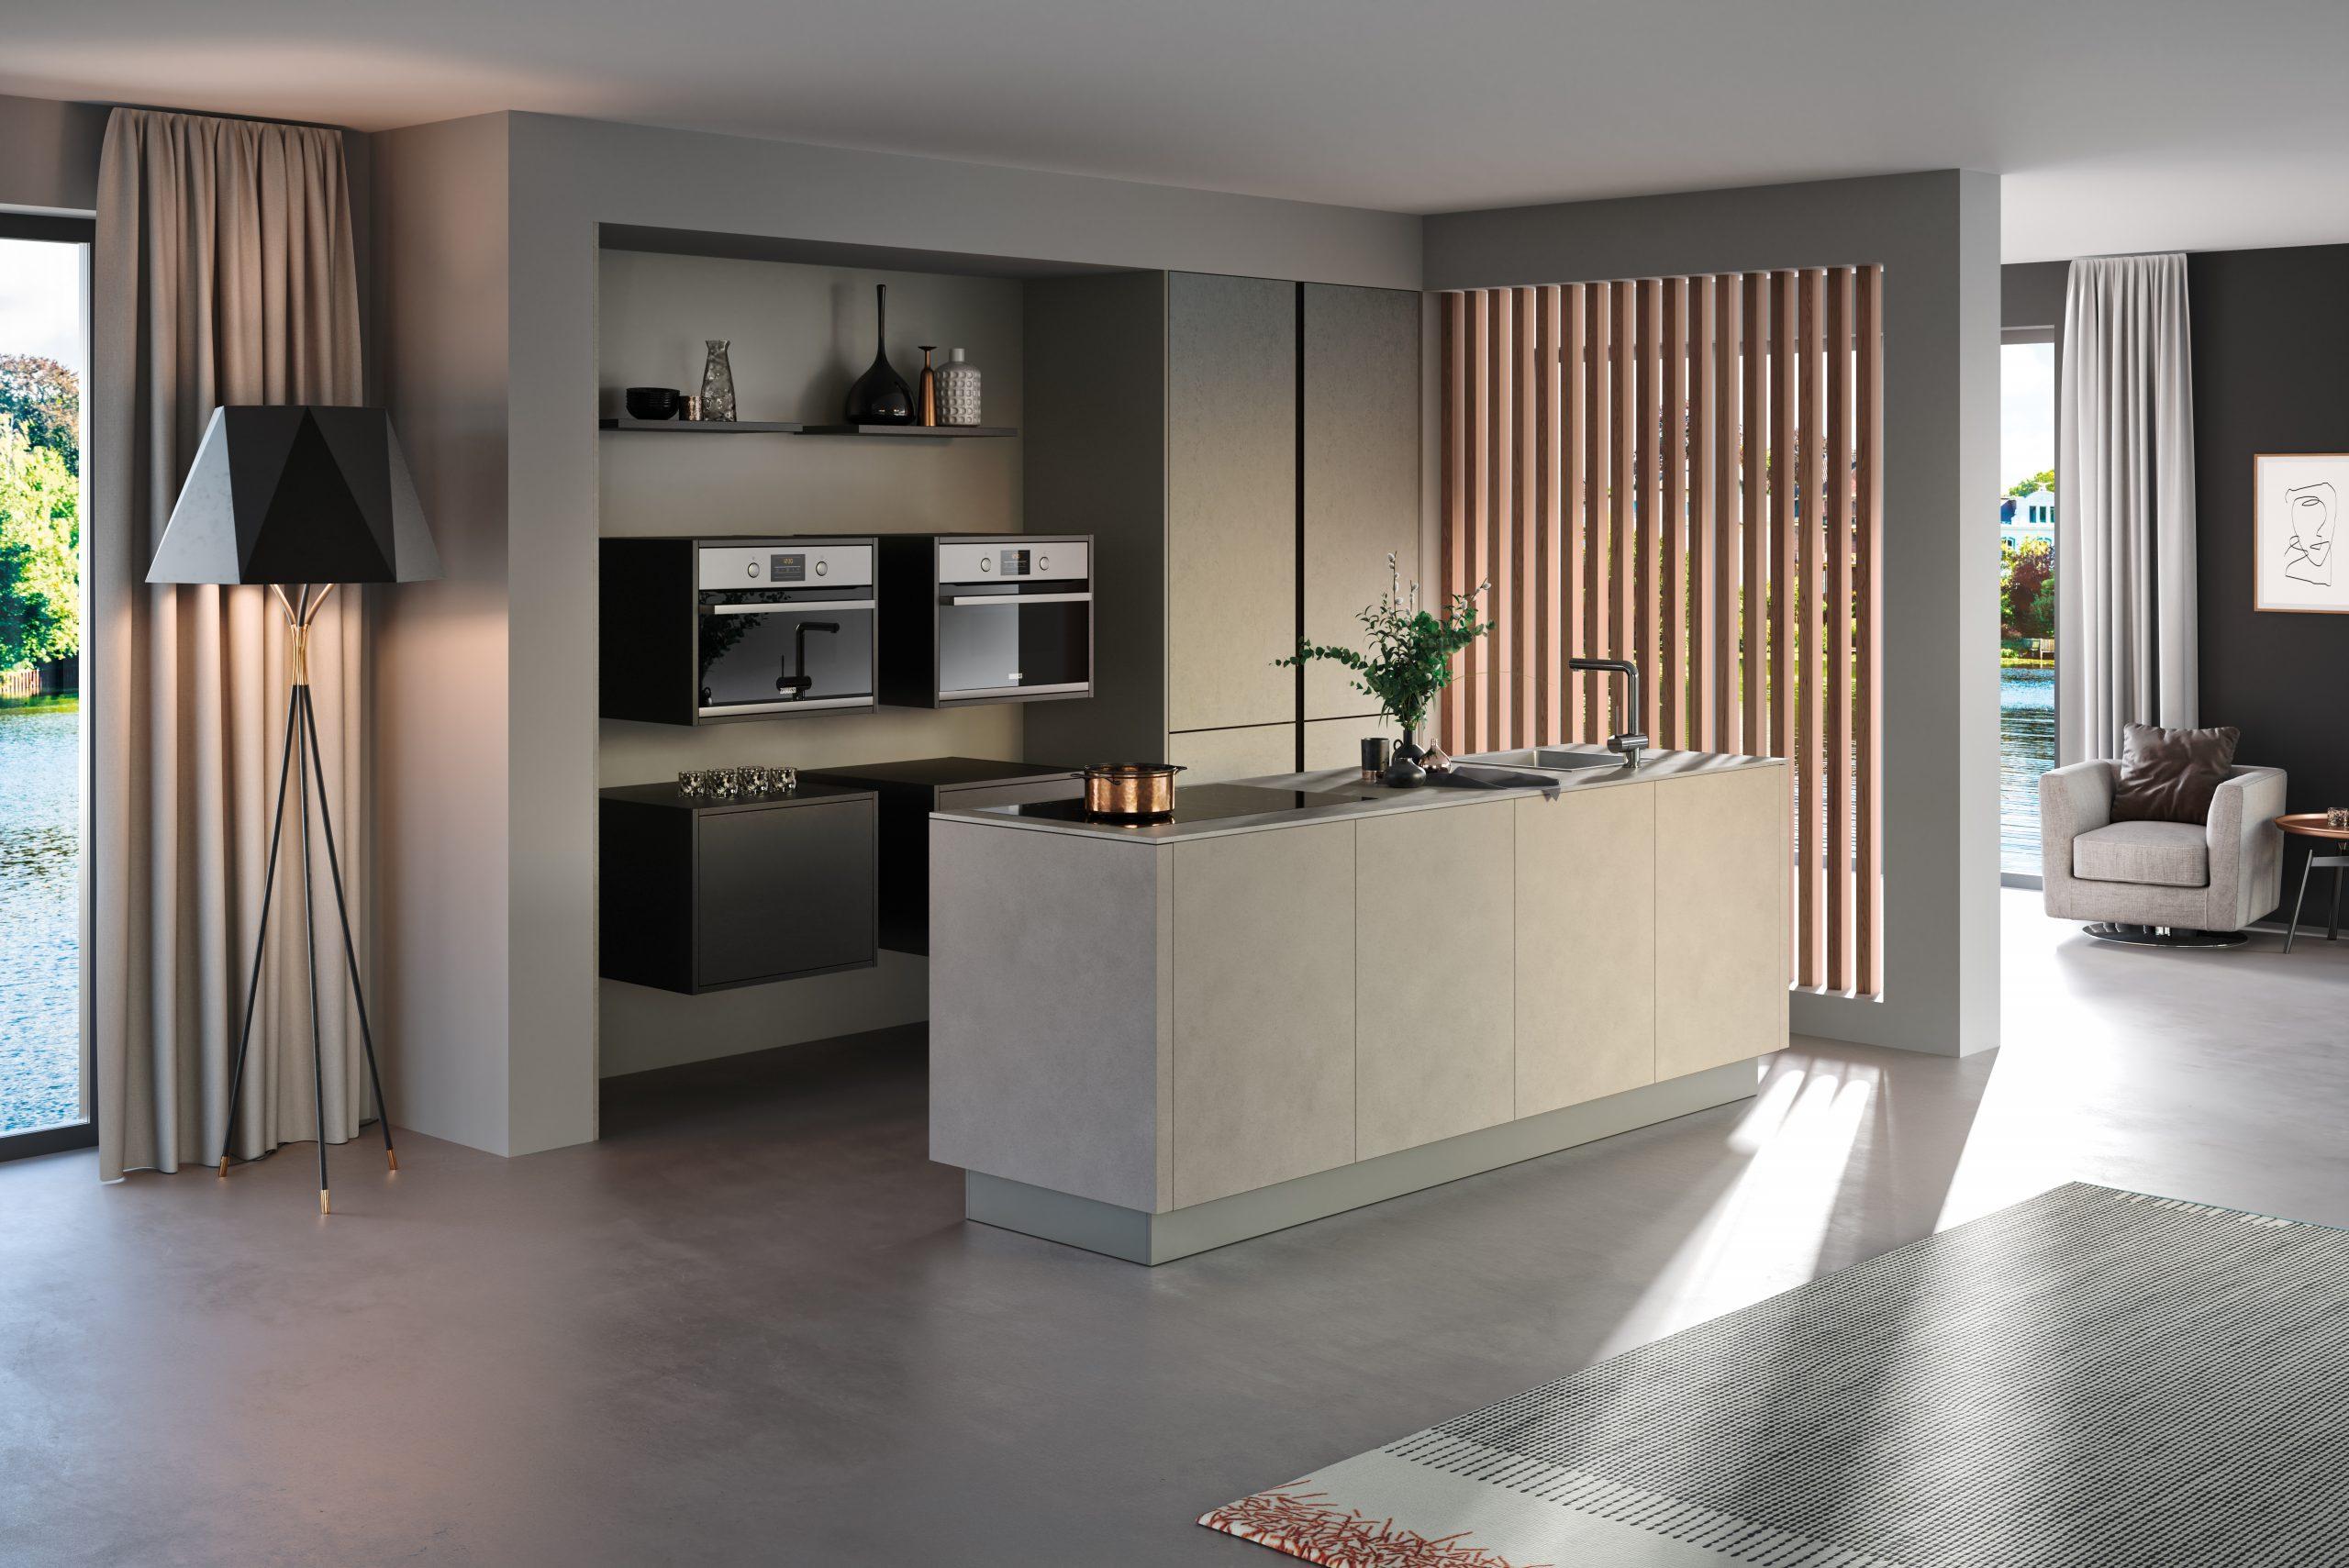 Steenhuizen keukens